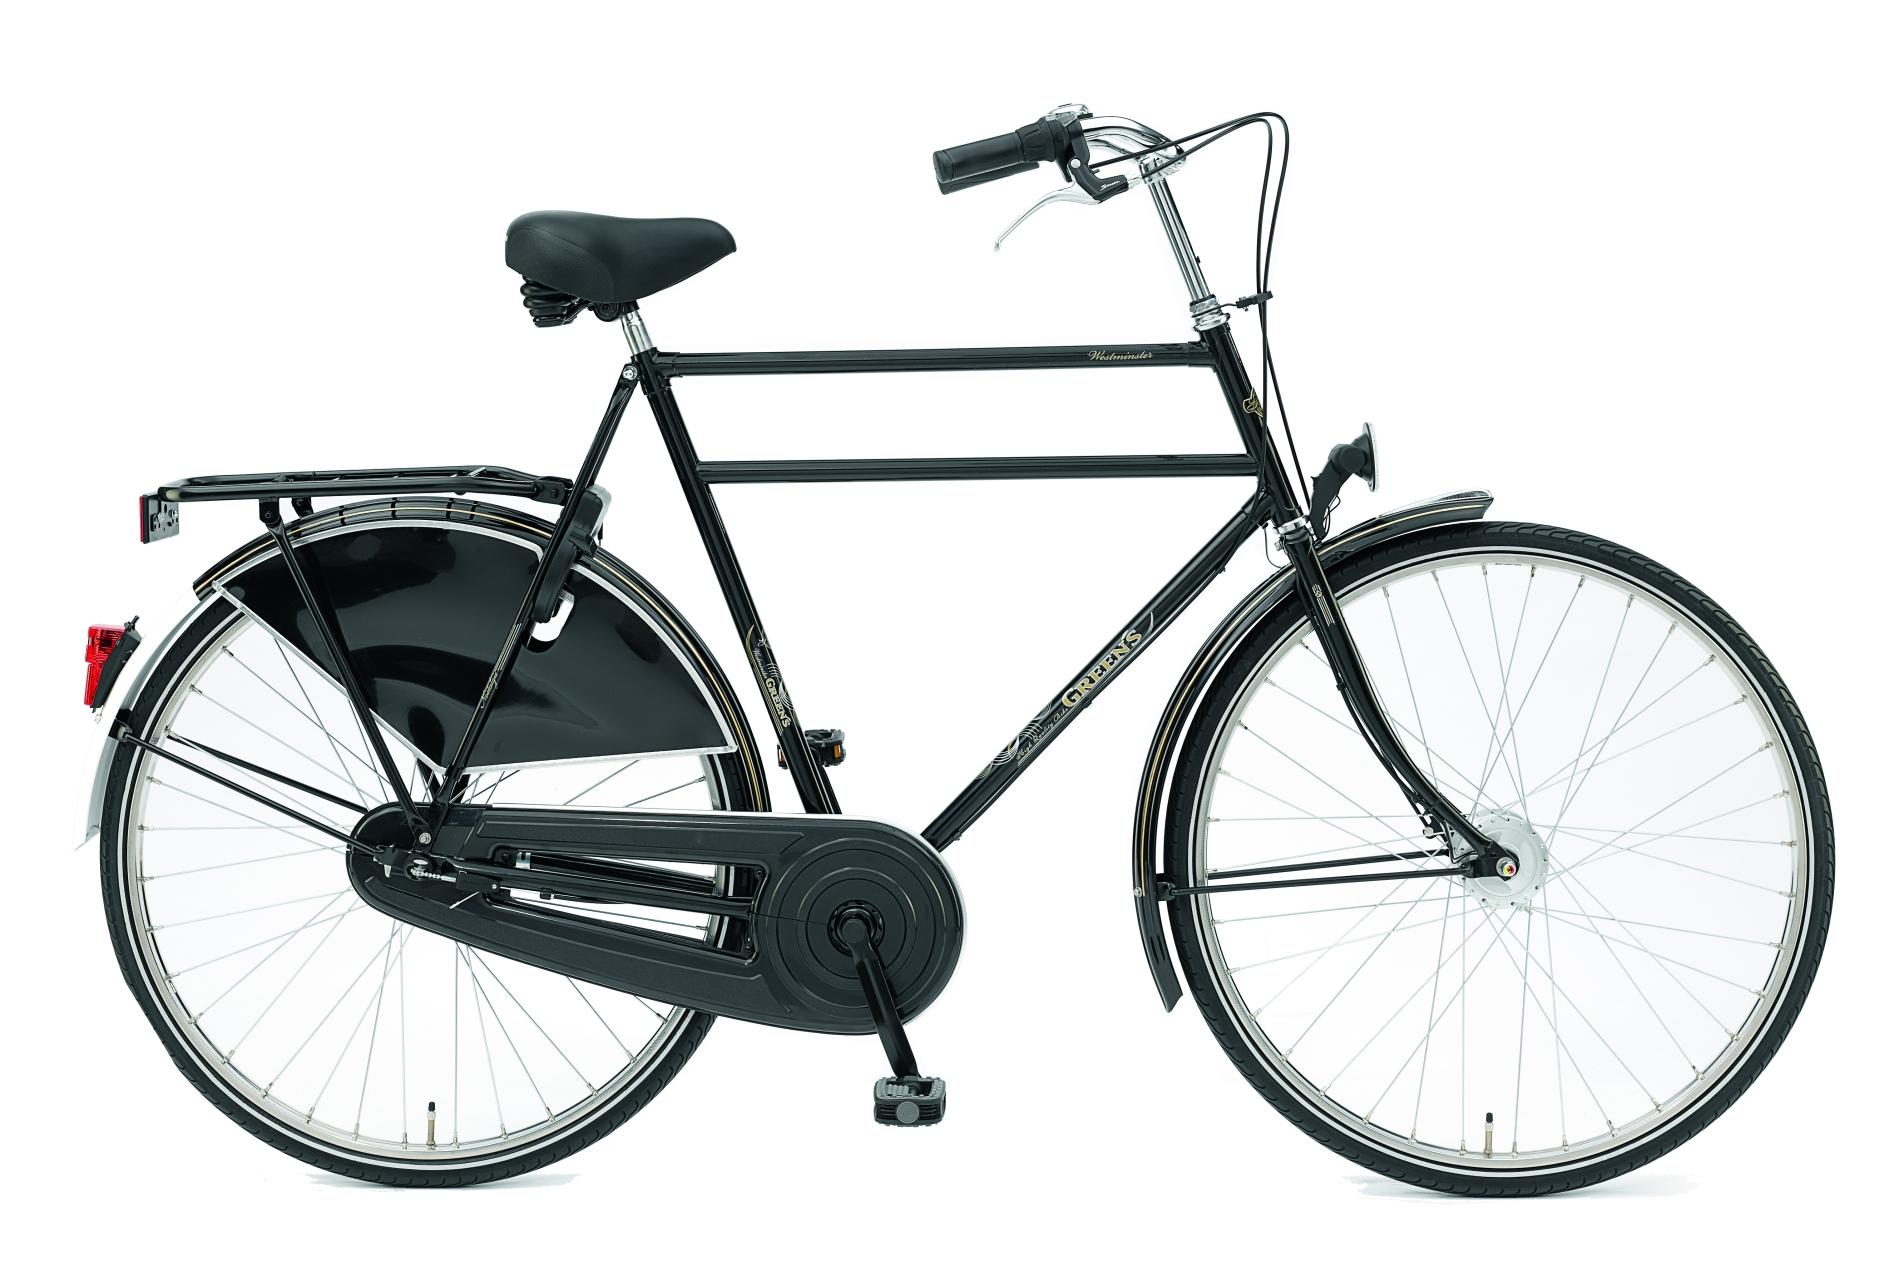 Neu Das Hollandrad Kultiges Fahrrad Fur Stadt Und Land